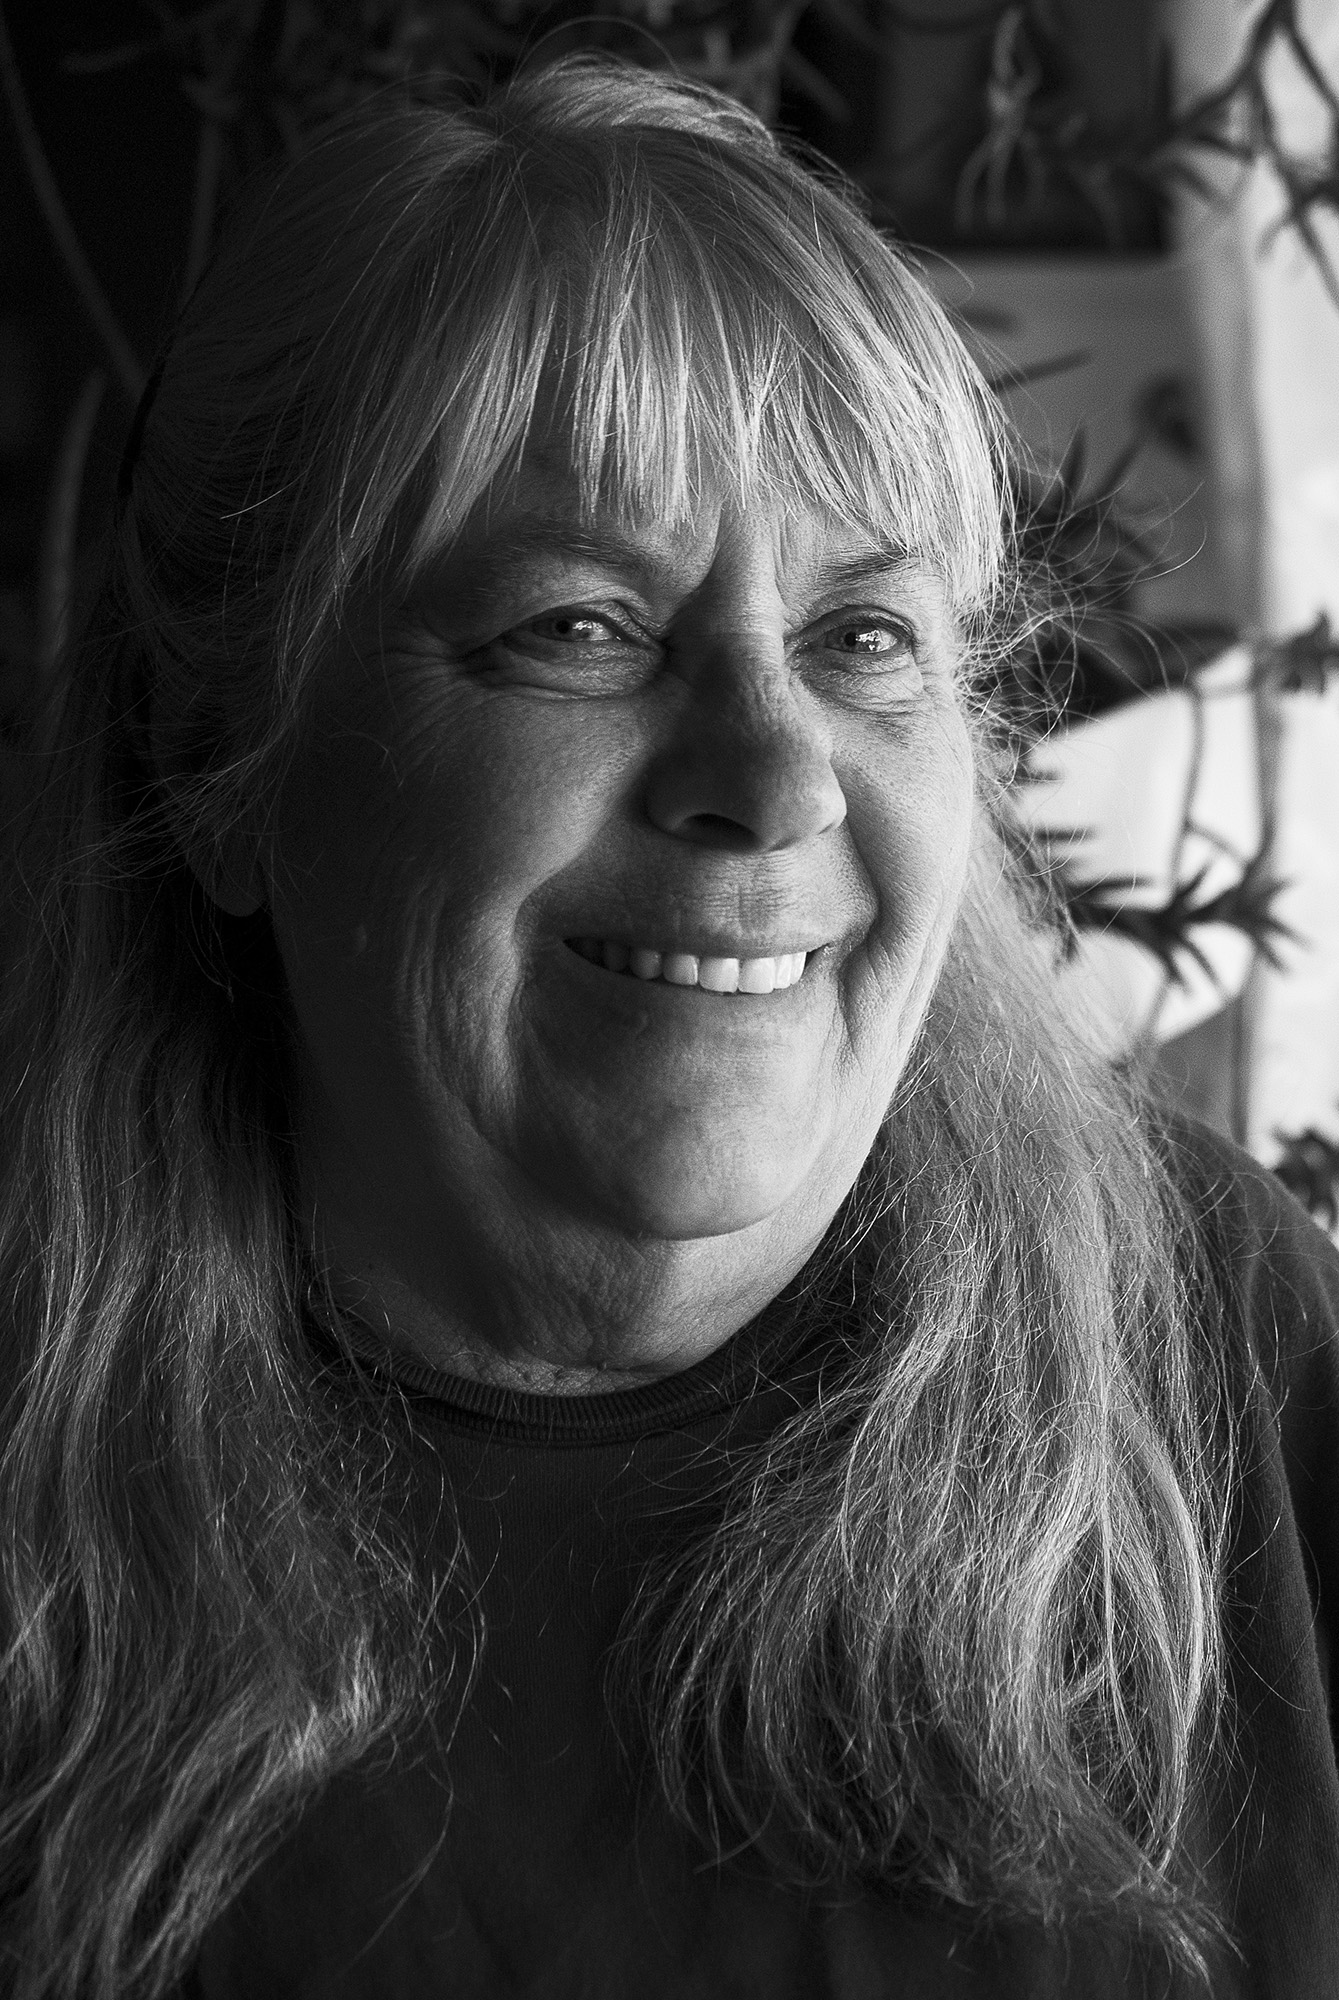 Black and white Portraits Copyright Mary Vasquez (2)